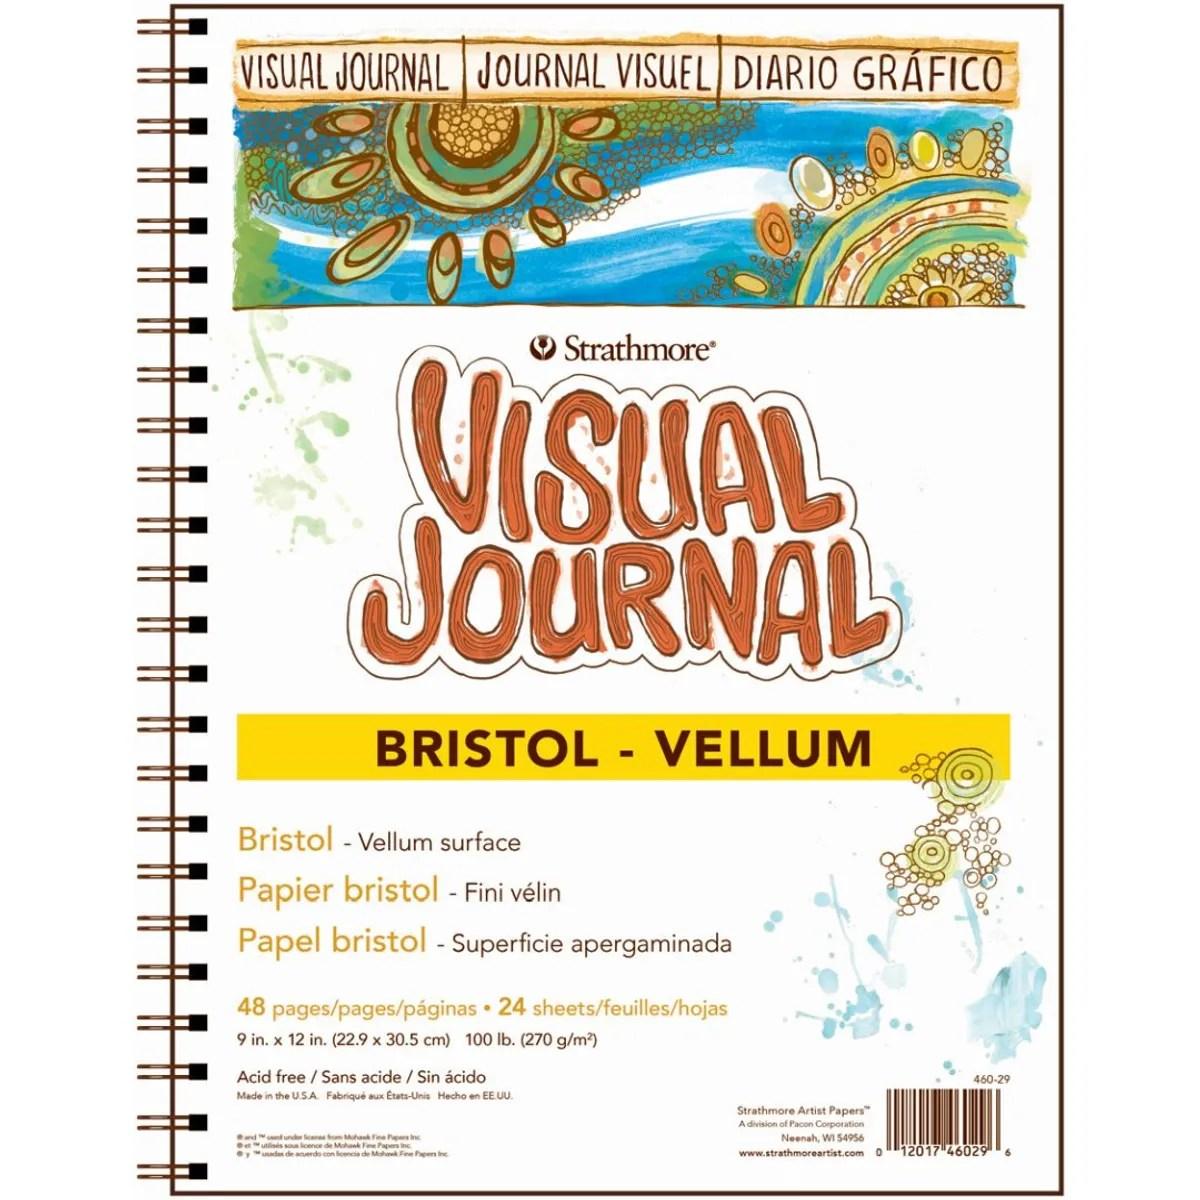 Strathmore 300 Bristol Vellum Visual Journal 9x12